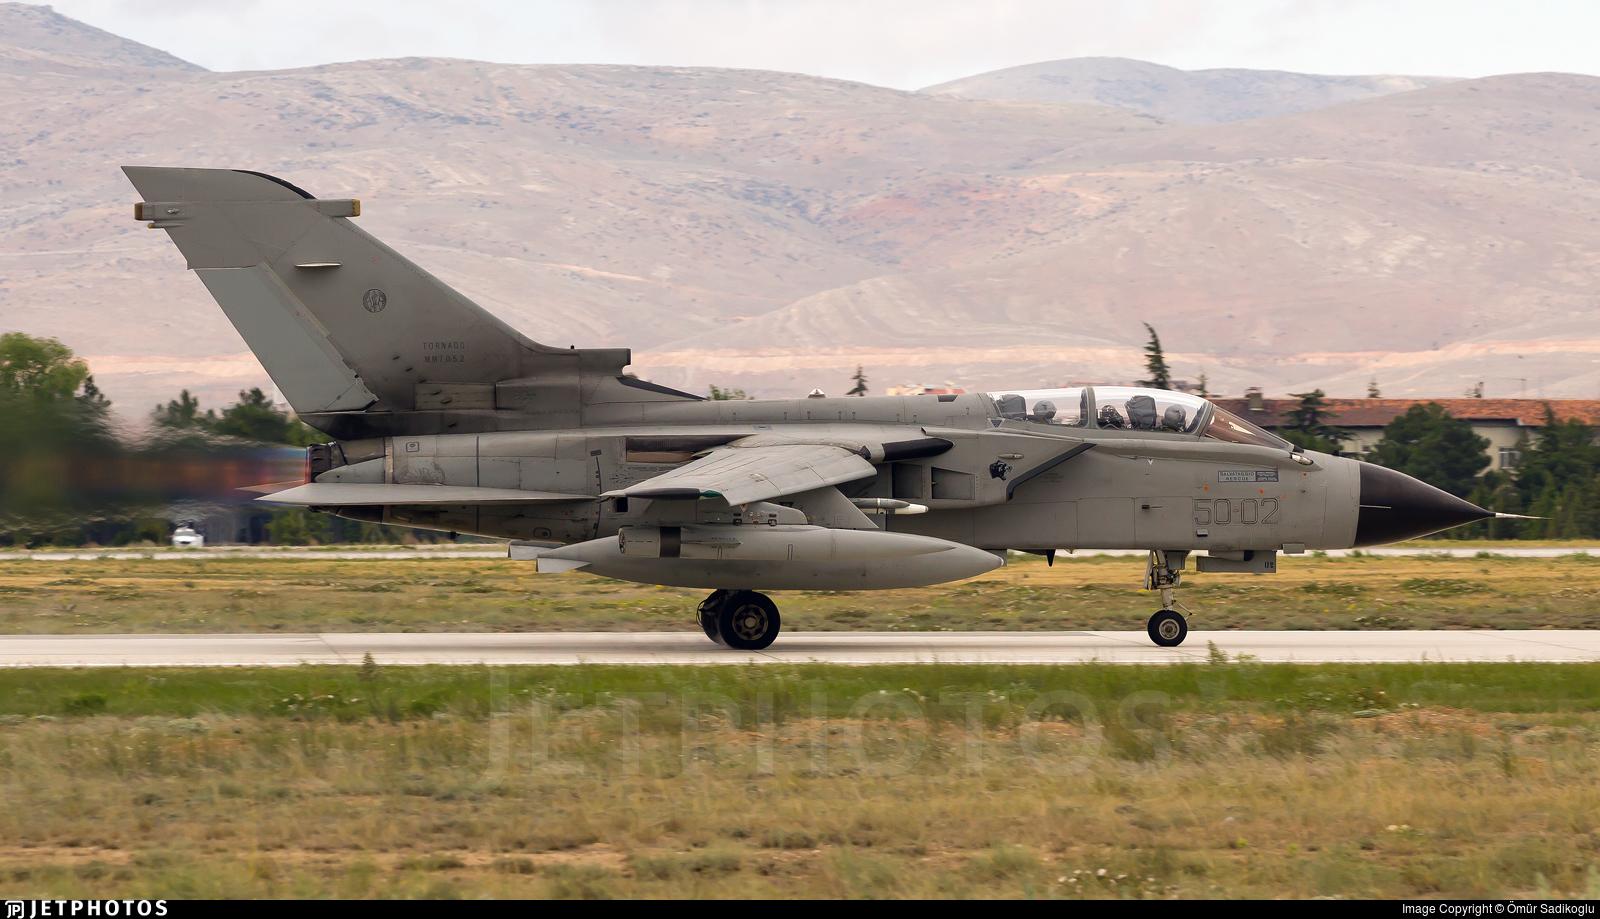 MM7052 - Panavia Tornado IDS - Italy - Air Force